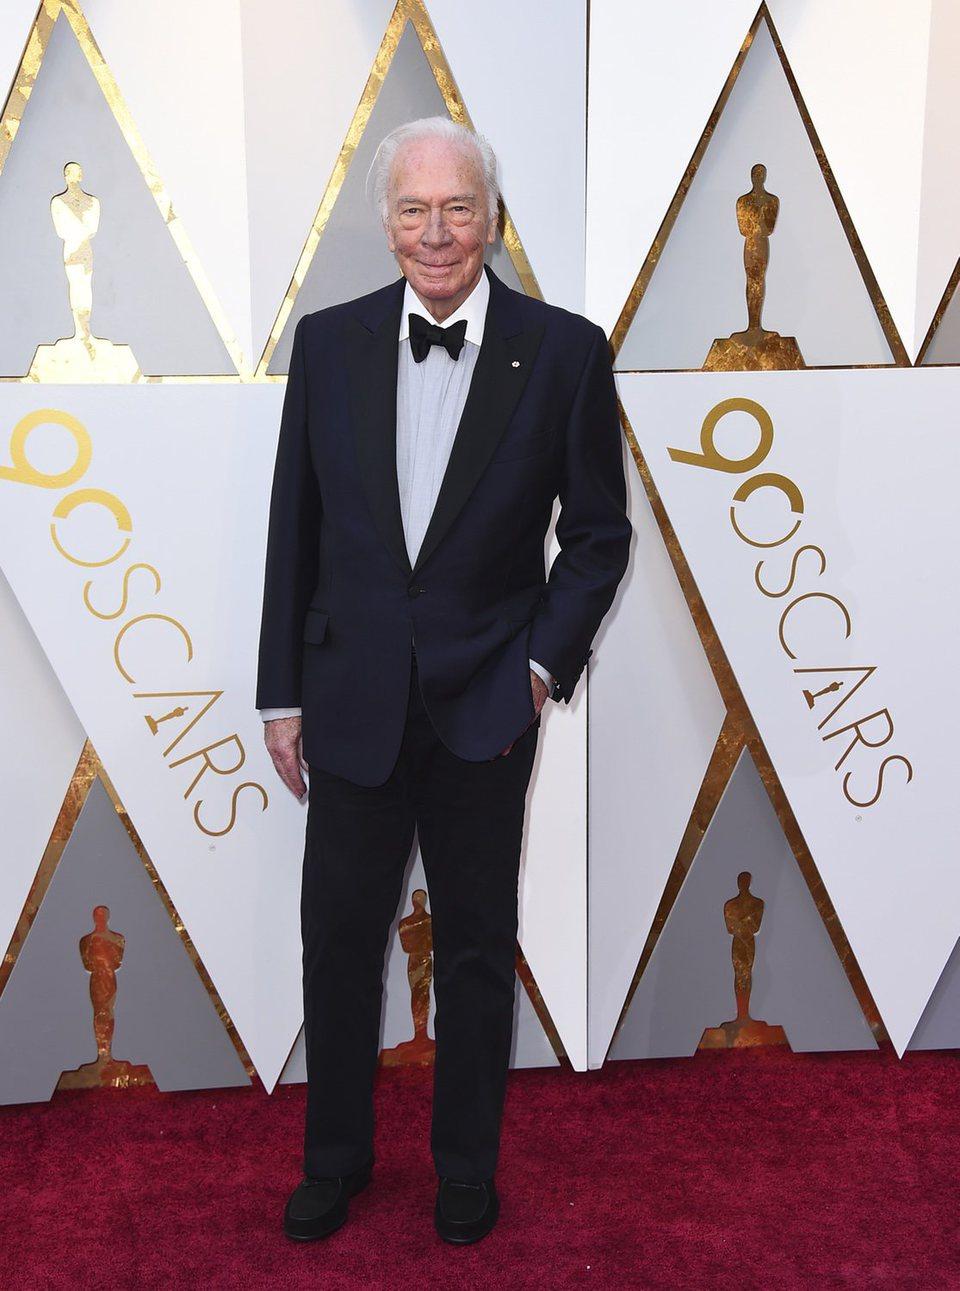 Christopher Plummer en la alfombra roja de los Oscar 2018